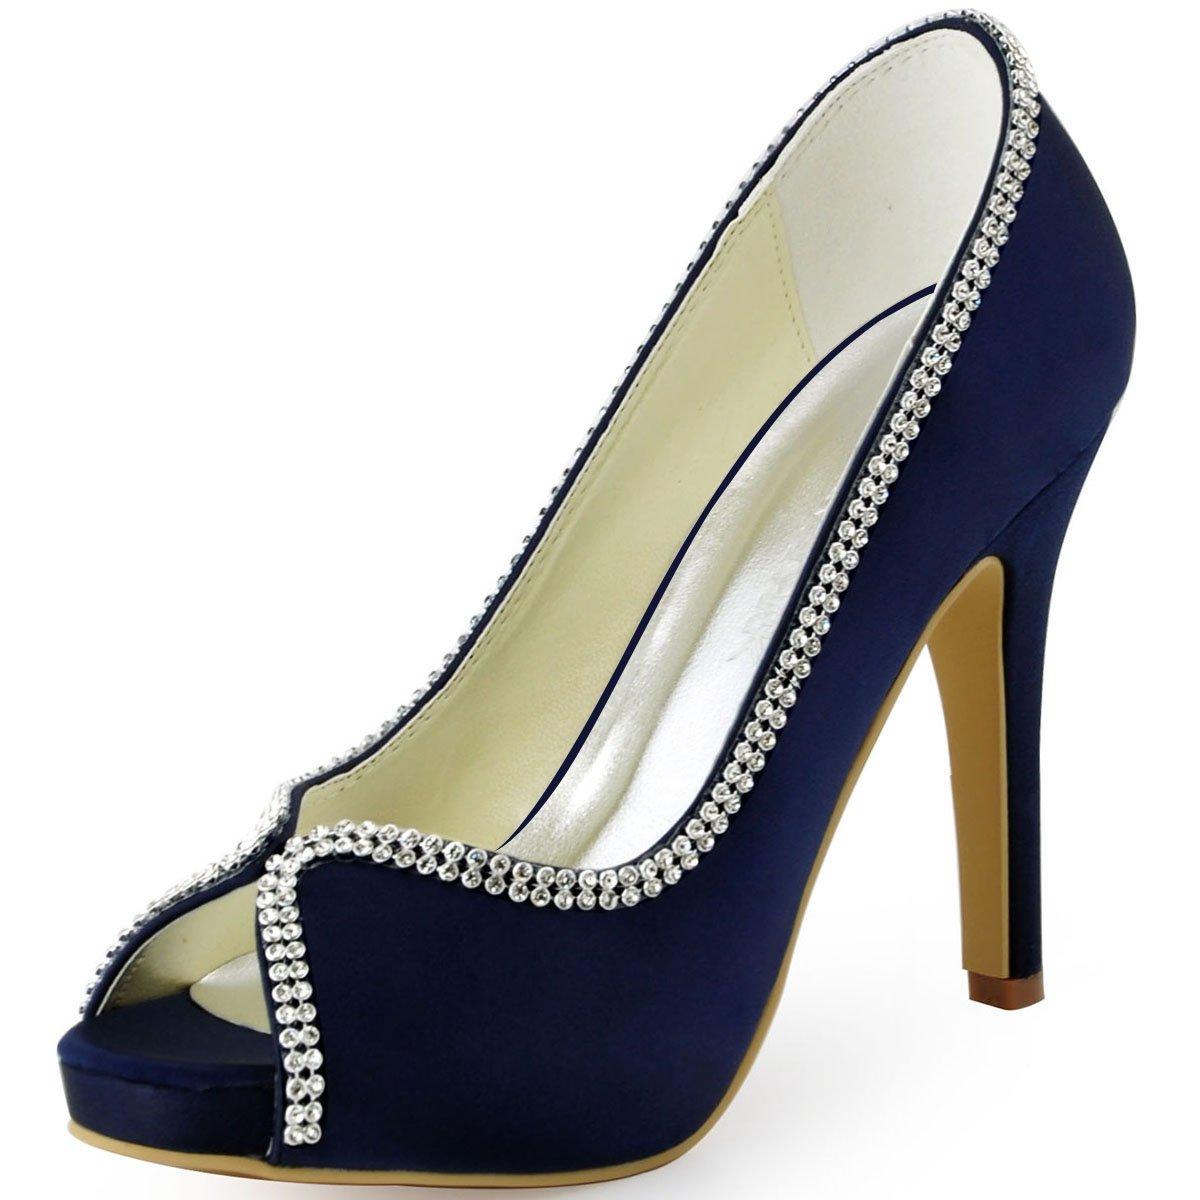 ElegantPark EP11083 Women Pumps Peep Toe Rhinestones Platform High Heel Satin Evening Wedding Dress Shoes B01196GO94 5 B(M) US (true fitting 6 US)|Navy Blue